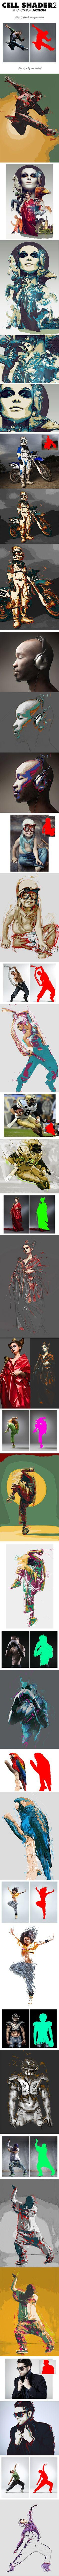 Cell Shader 2 Photoshop Action #design Download: http://graphicriver.net/item/cell-shader-2-photoshop-action/10624176?ref=ksioks